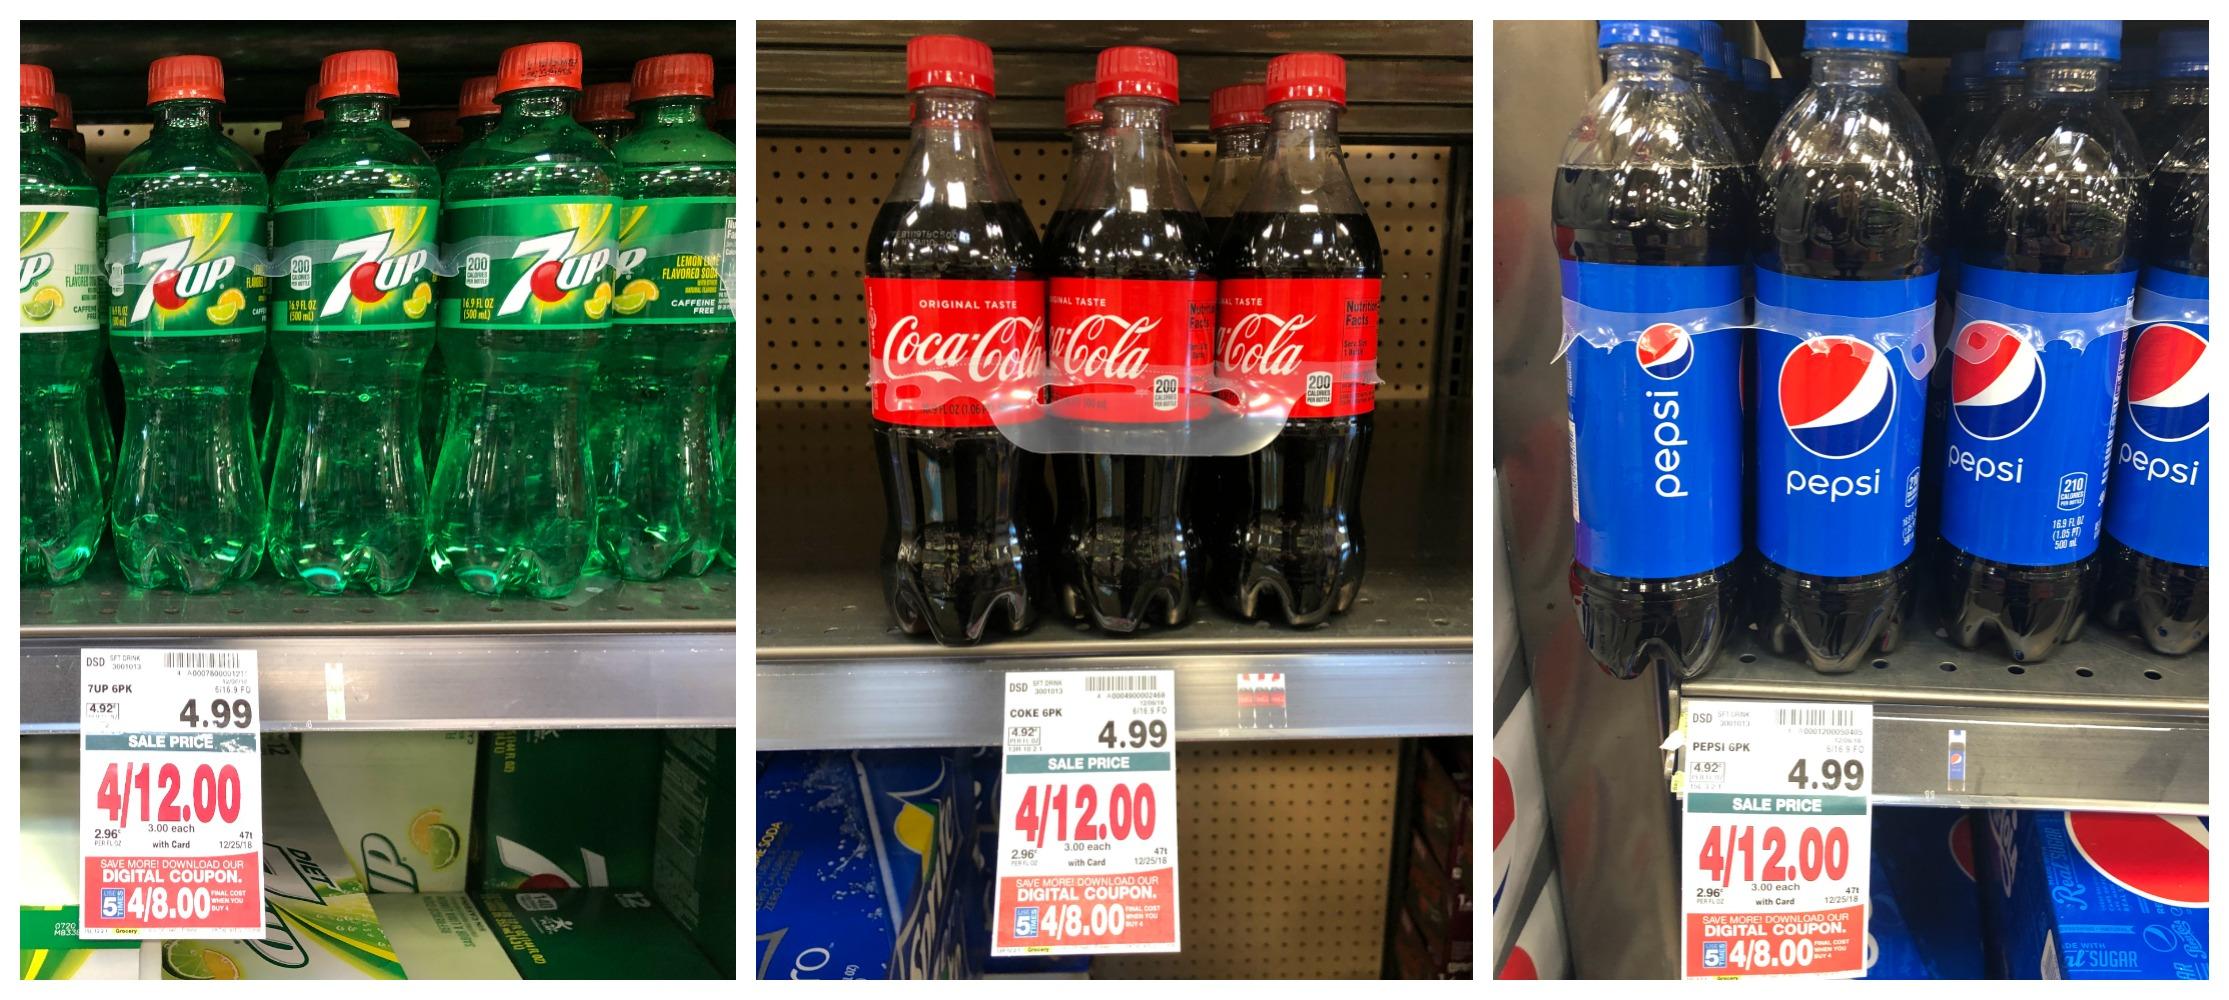 Pepsi 7up Or Coca Cola Products 6 Pack Bottles Just 2 00 At Kroger